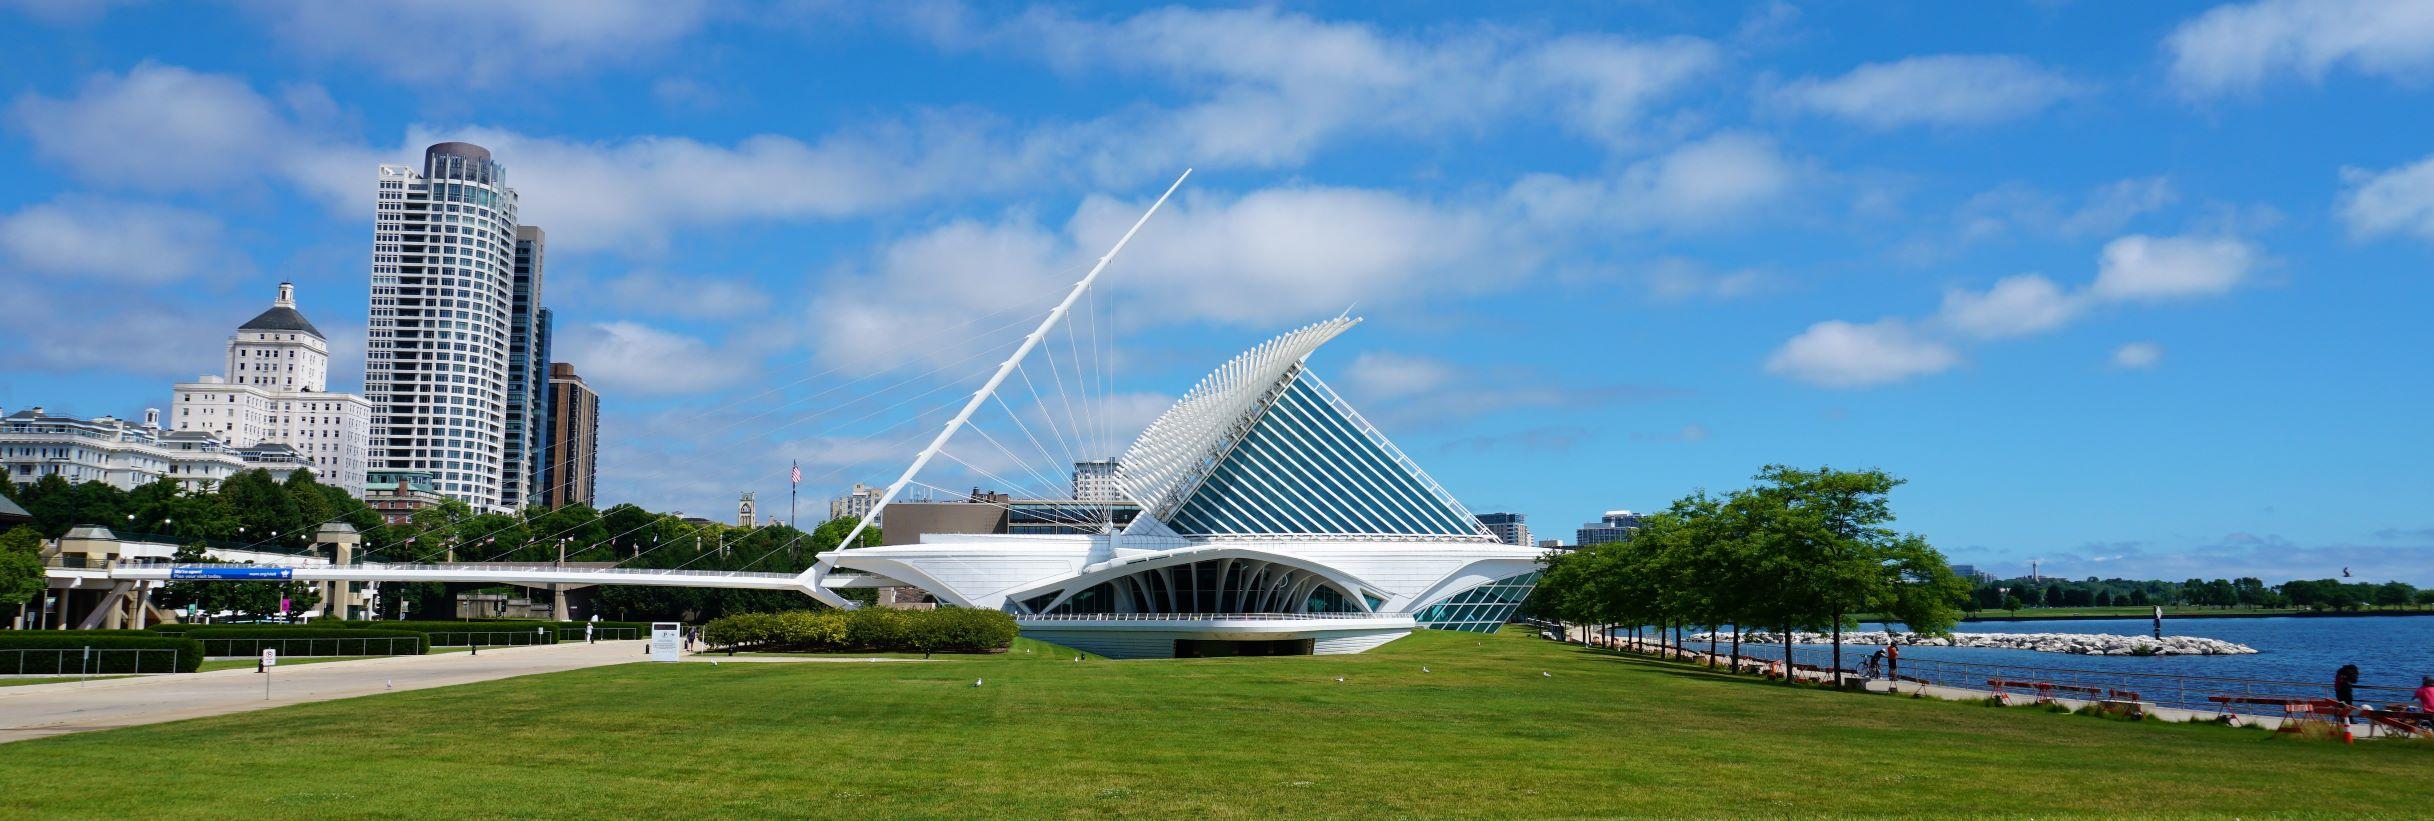 Pic 2020-0716 03 Milwaukee (28) er